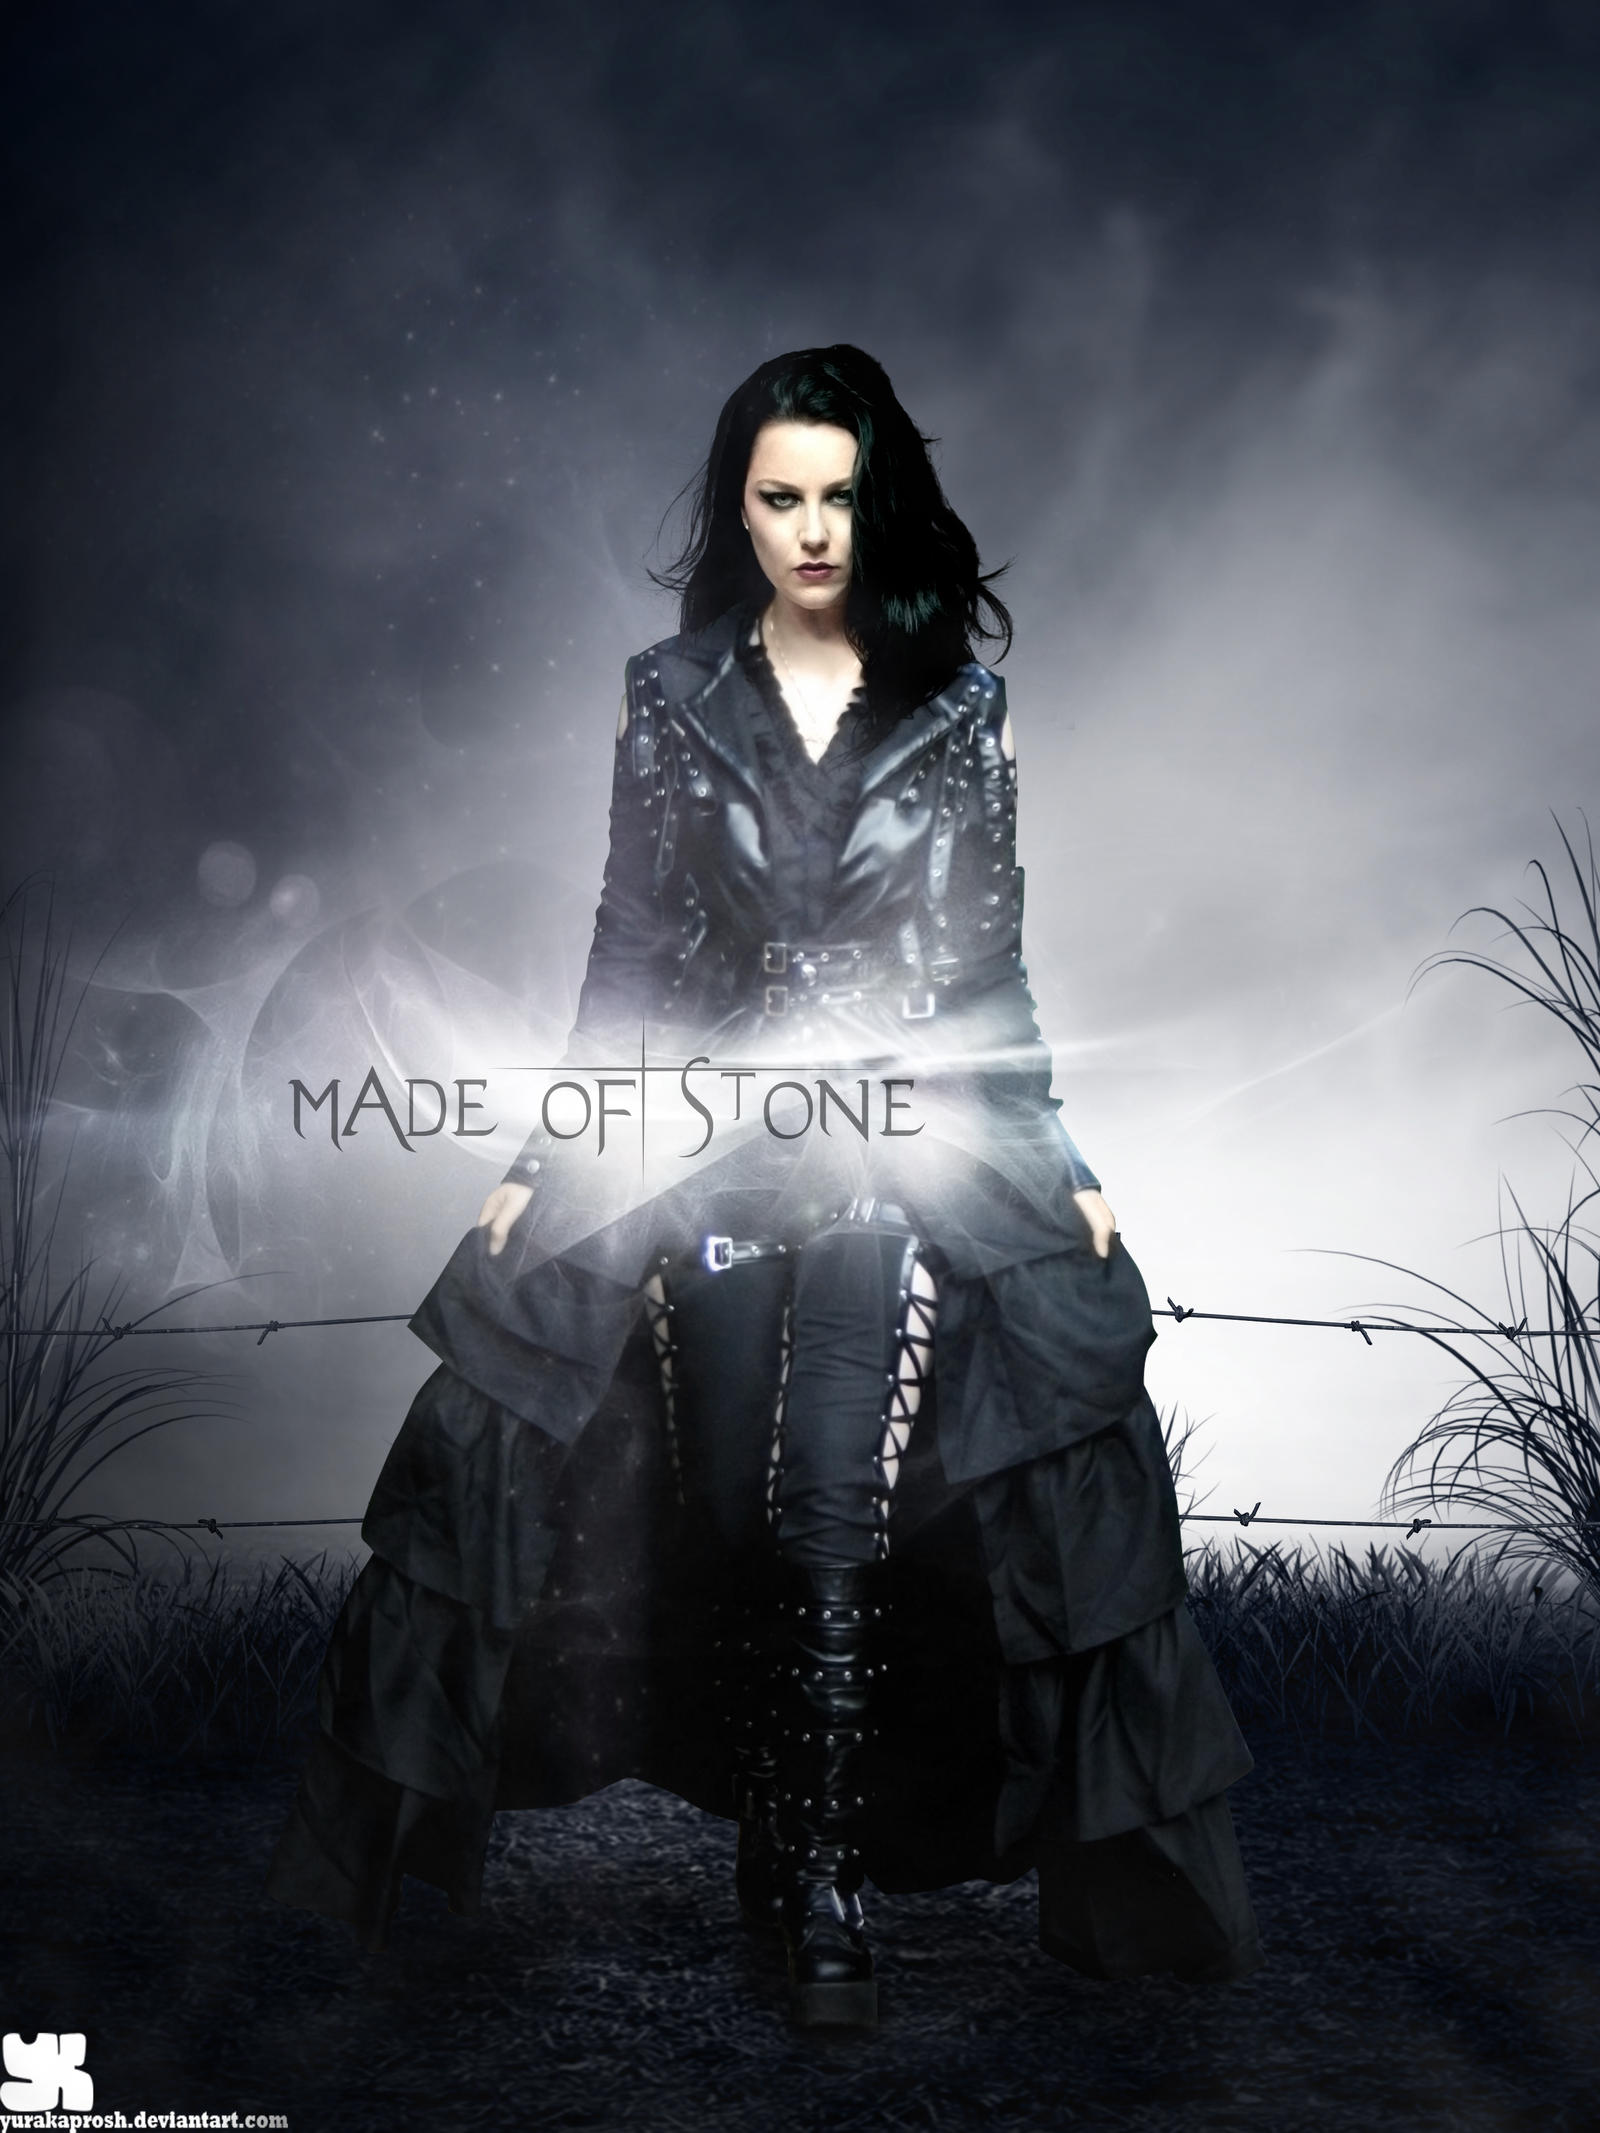 evanescence_Made of Stone by YuraKaprosh